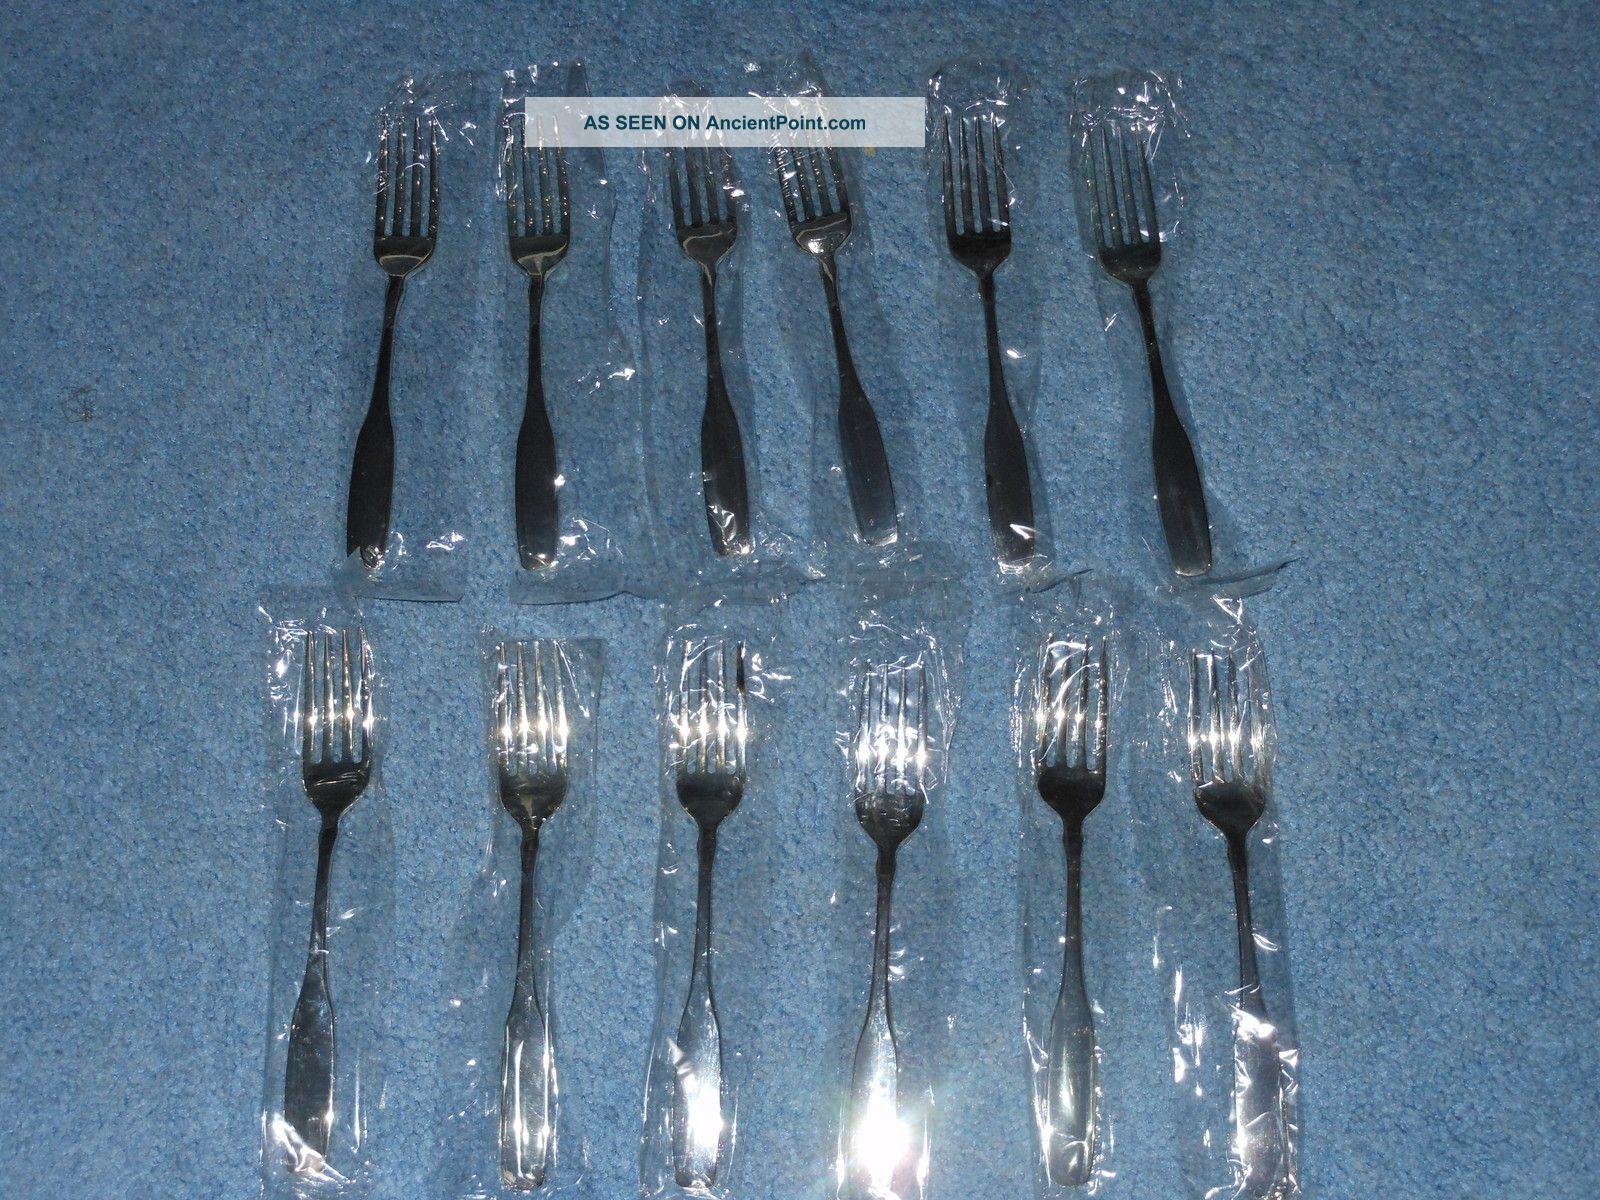 12 Pcs Oneida Ltd.  Silversmiths Bennington Silverplate Dinner Fork New Oneida/Wm. A. Rogers photo